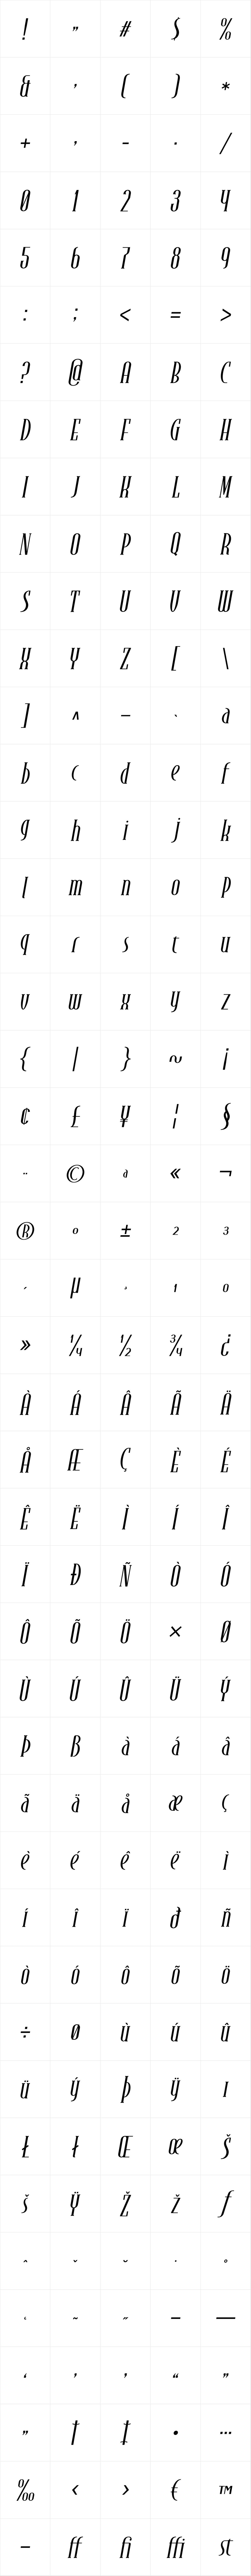 Endeavora Serif Slanted